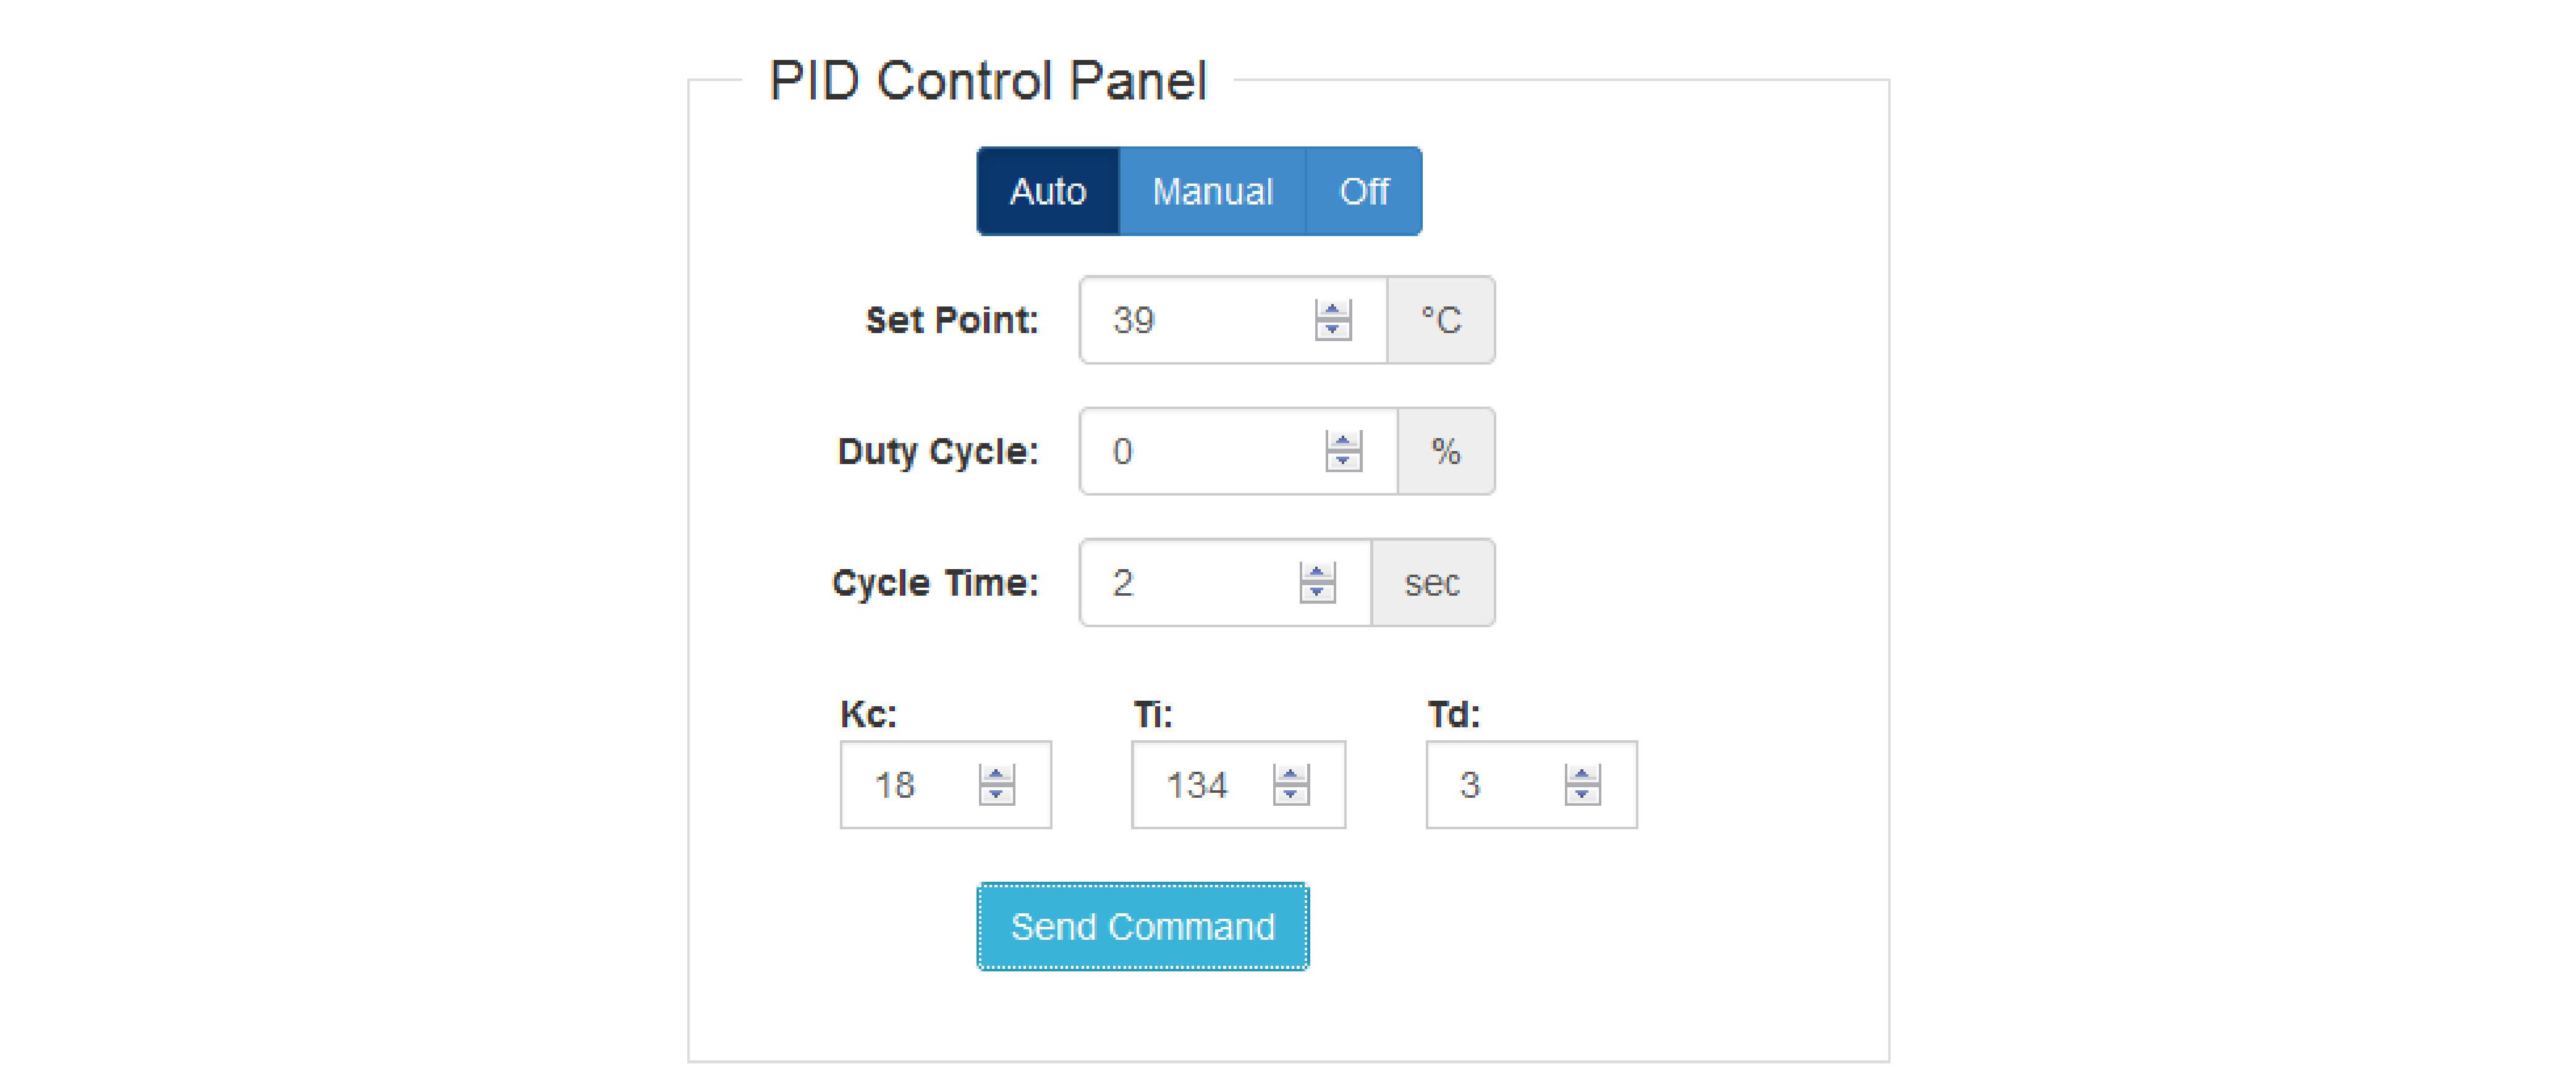 Schalk-PID-Control-Panel-08